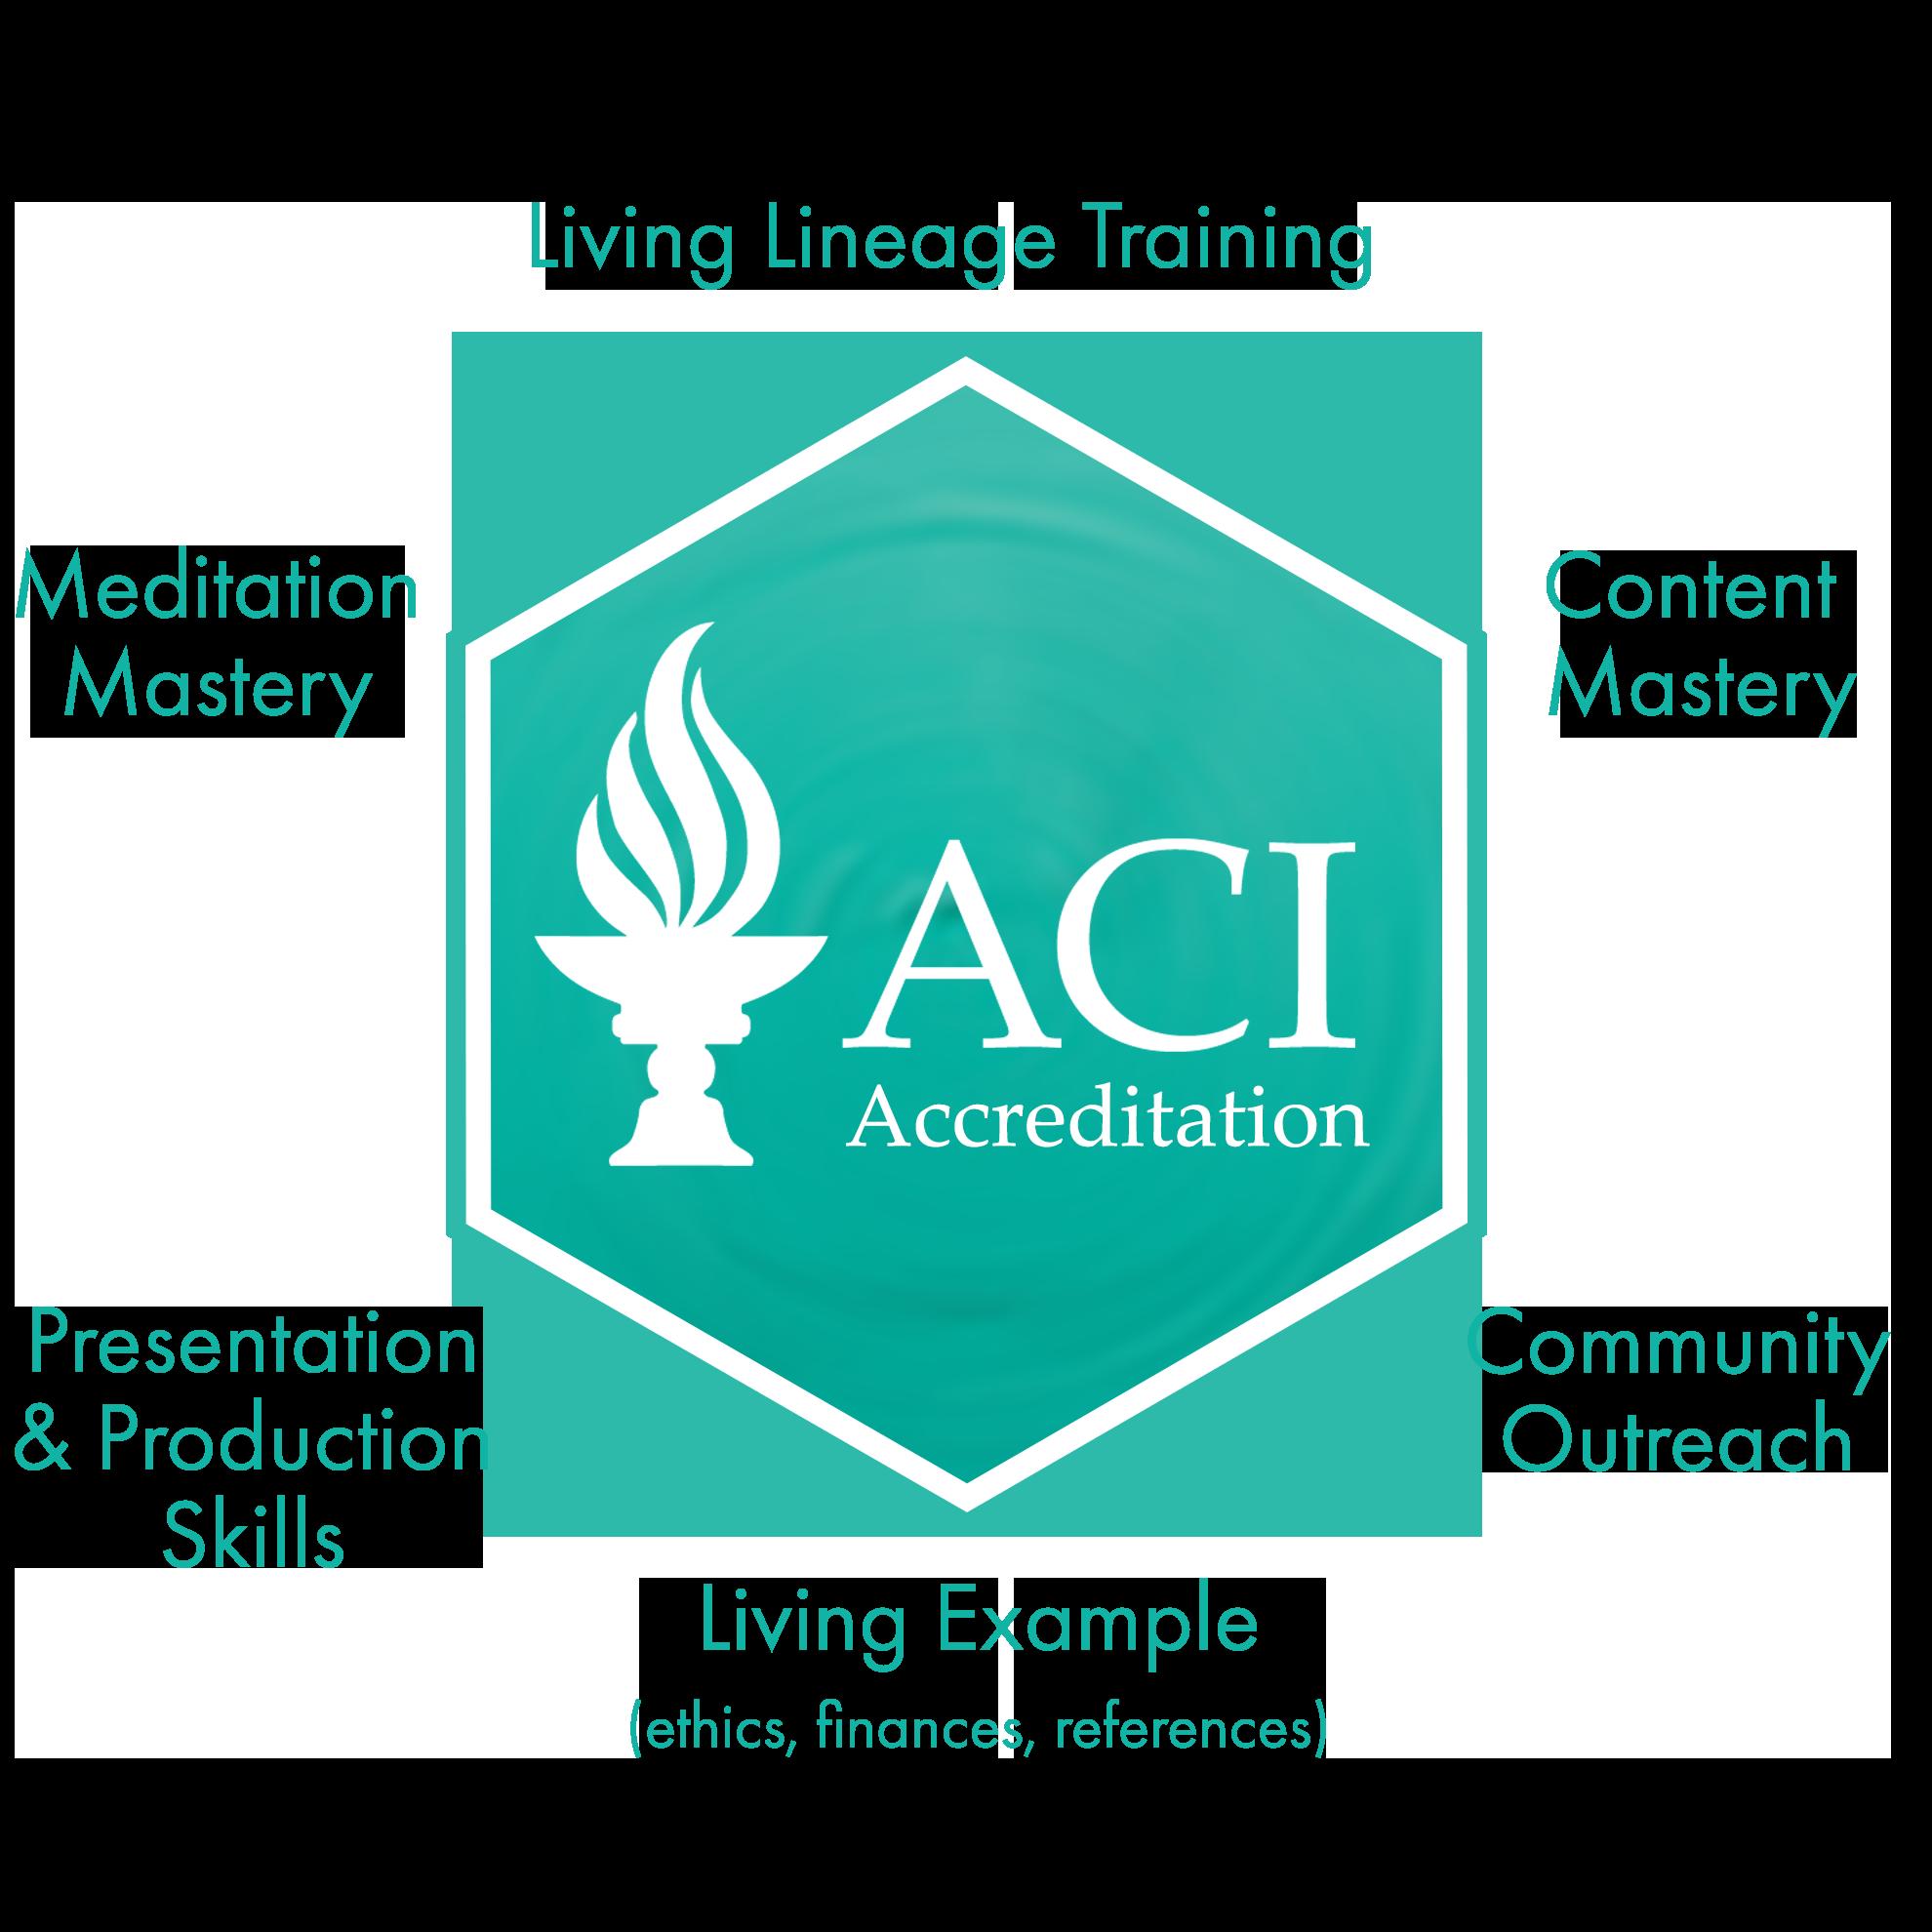 accreditation_image.png